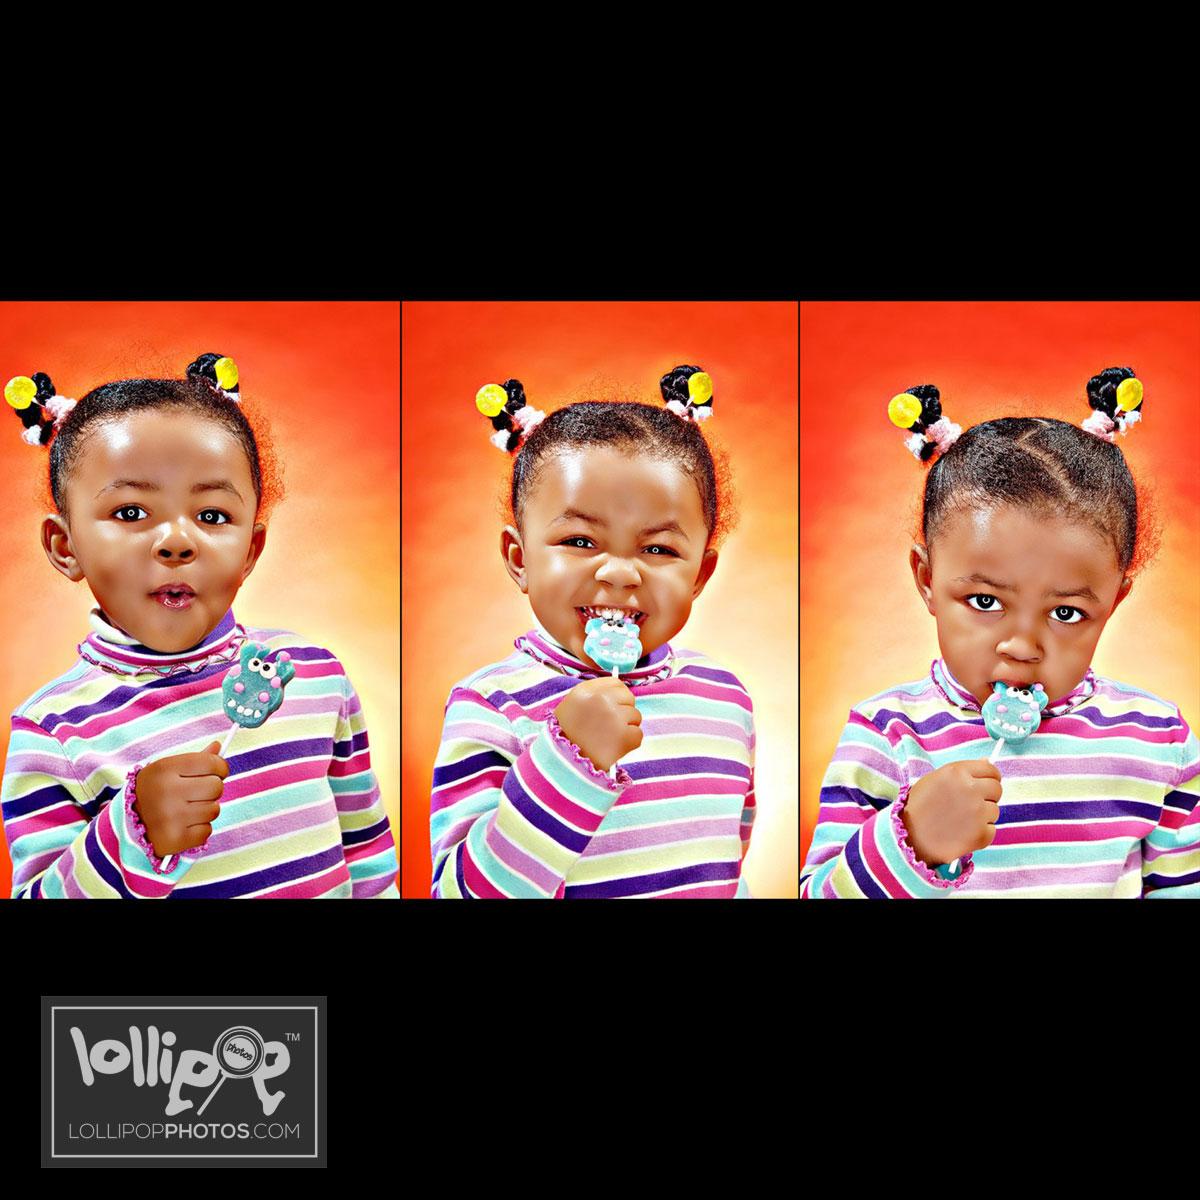 msdig-nora-canfield-lollipop-photos-549.jpg